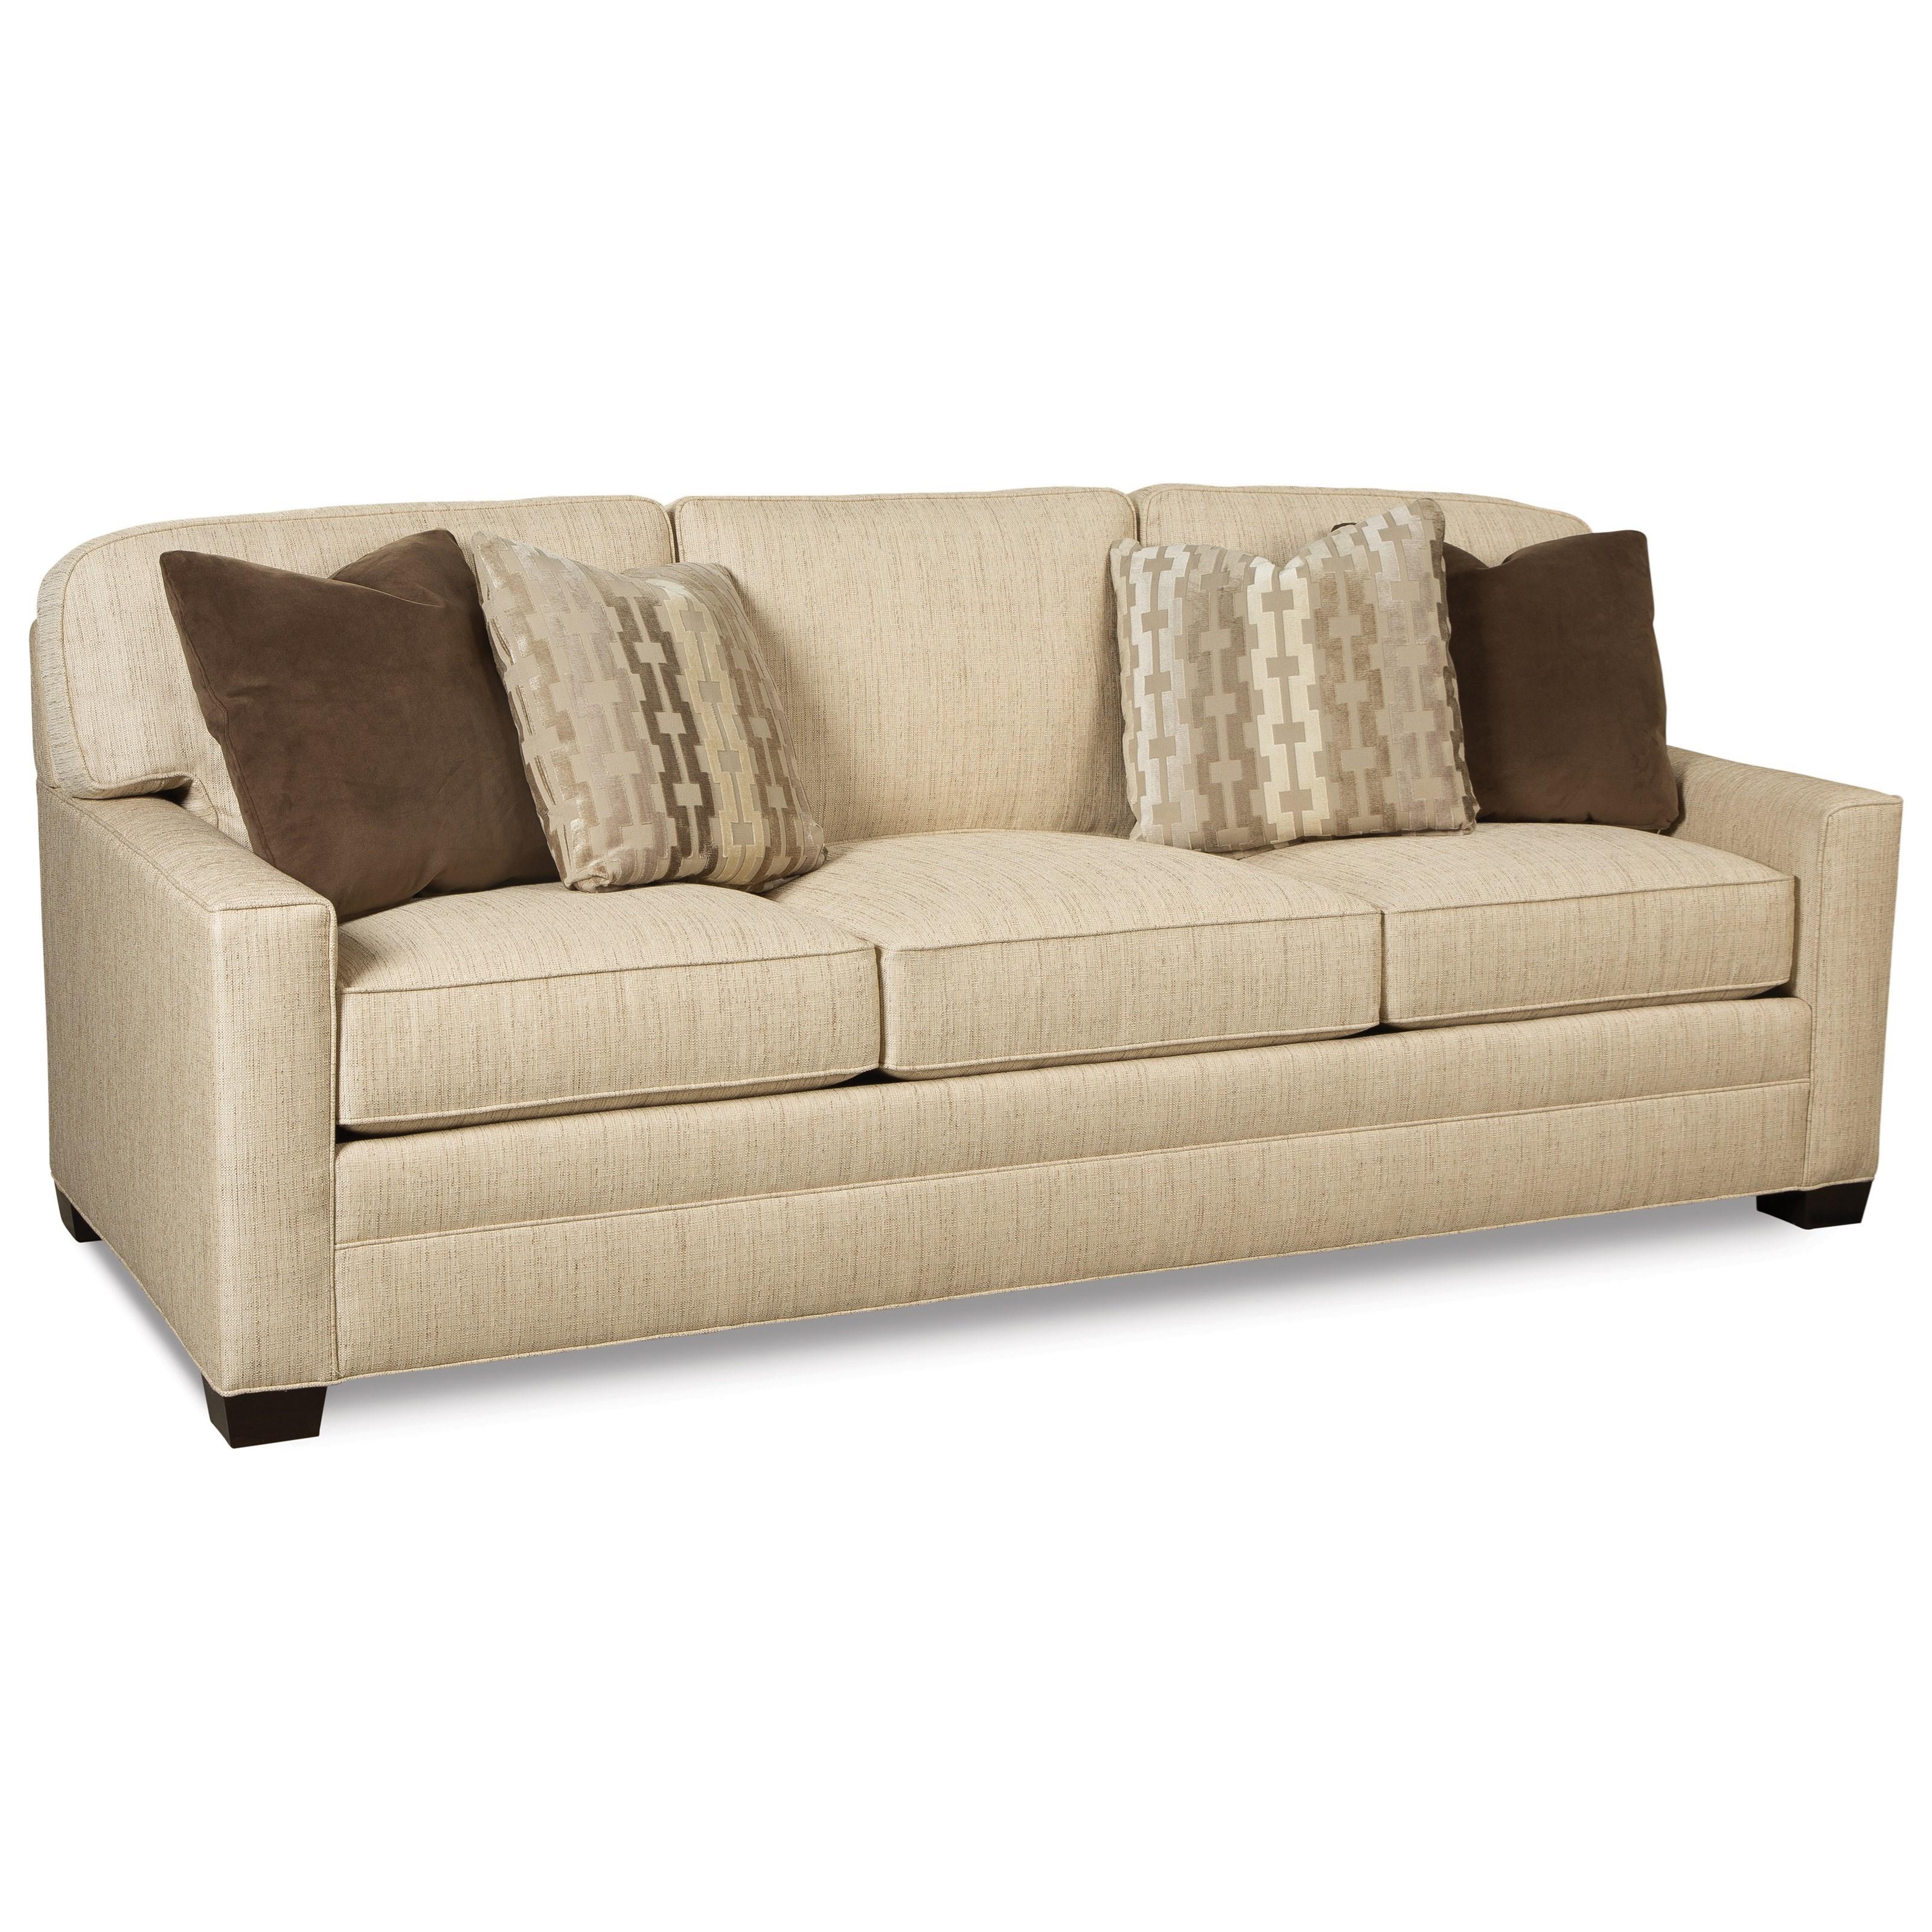 "2062 92"" Sofa by Geoffrey Alexander at Sprintz Furniture"